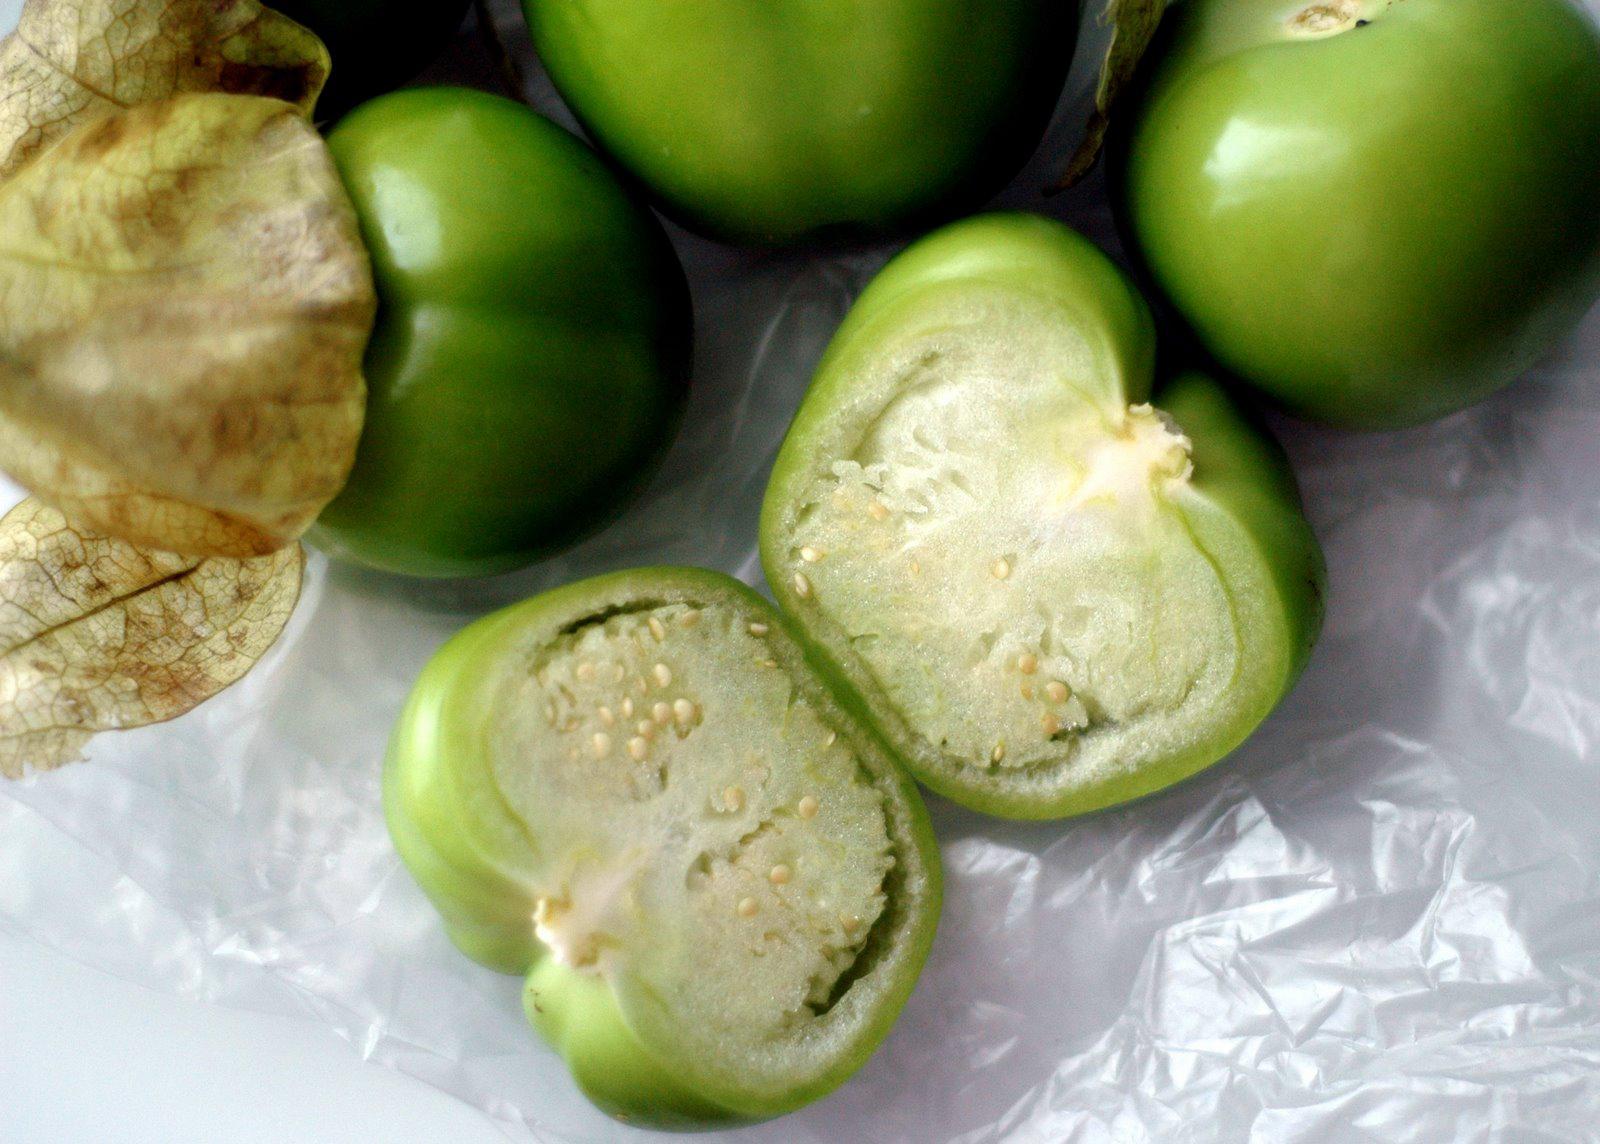 Tomatillo-half-cut